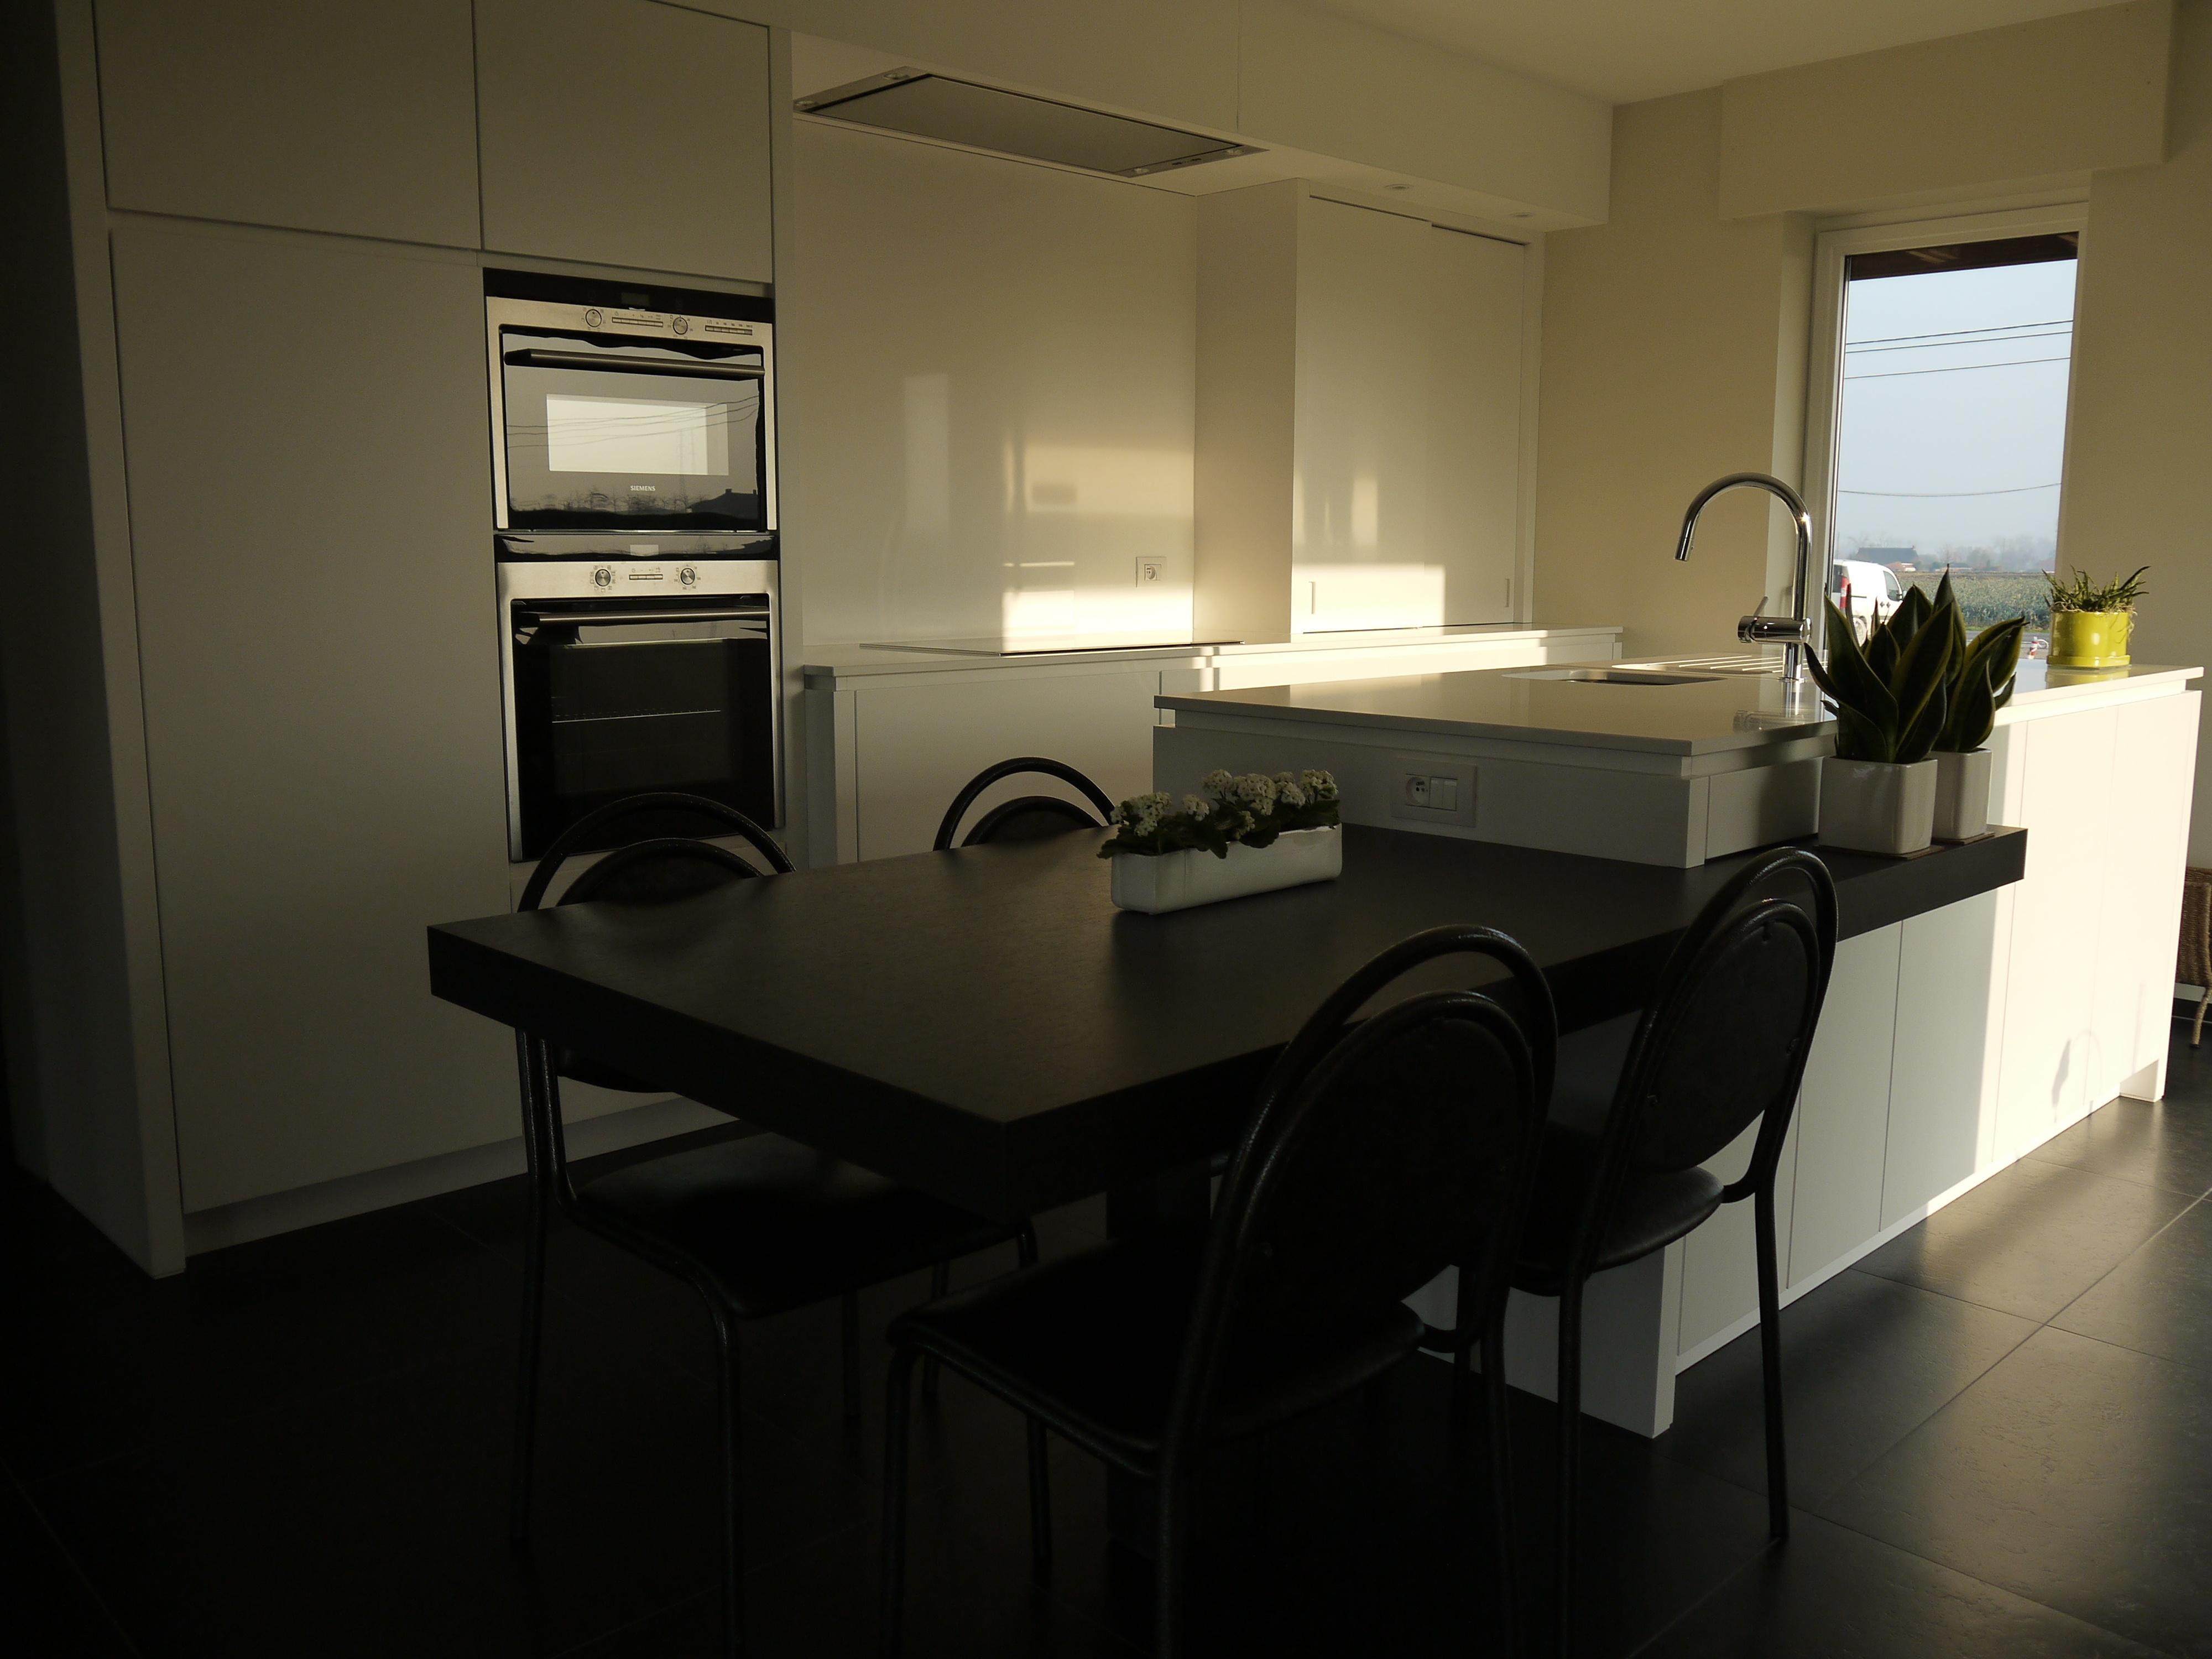 Keuken ontwerp eettafel eiland - Kleine centrale eiland goedkoop keuken ...